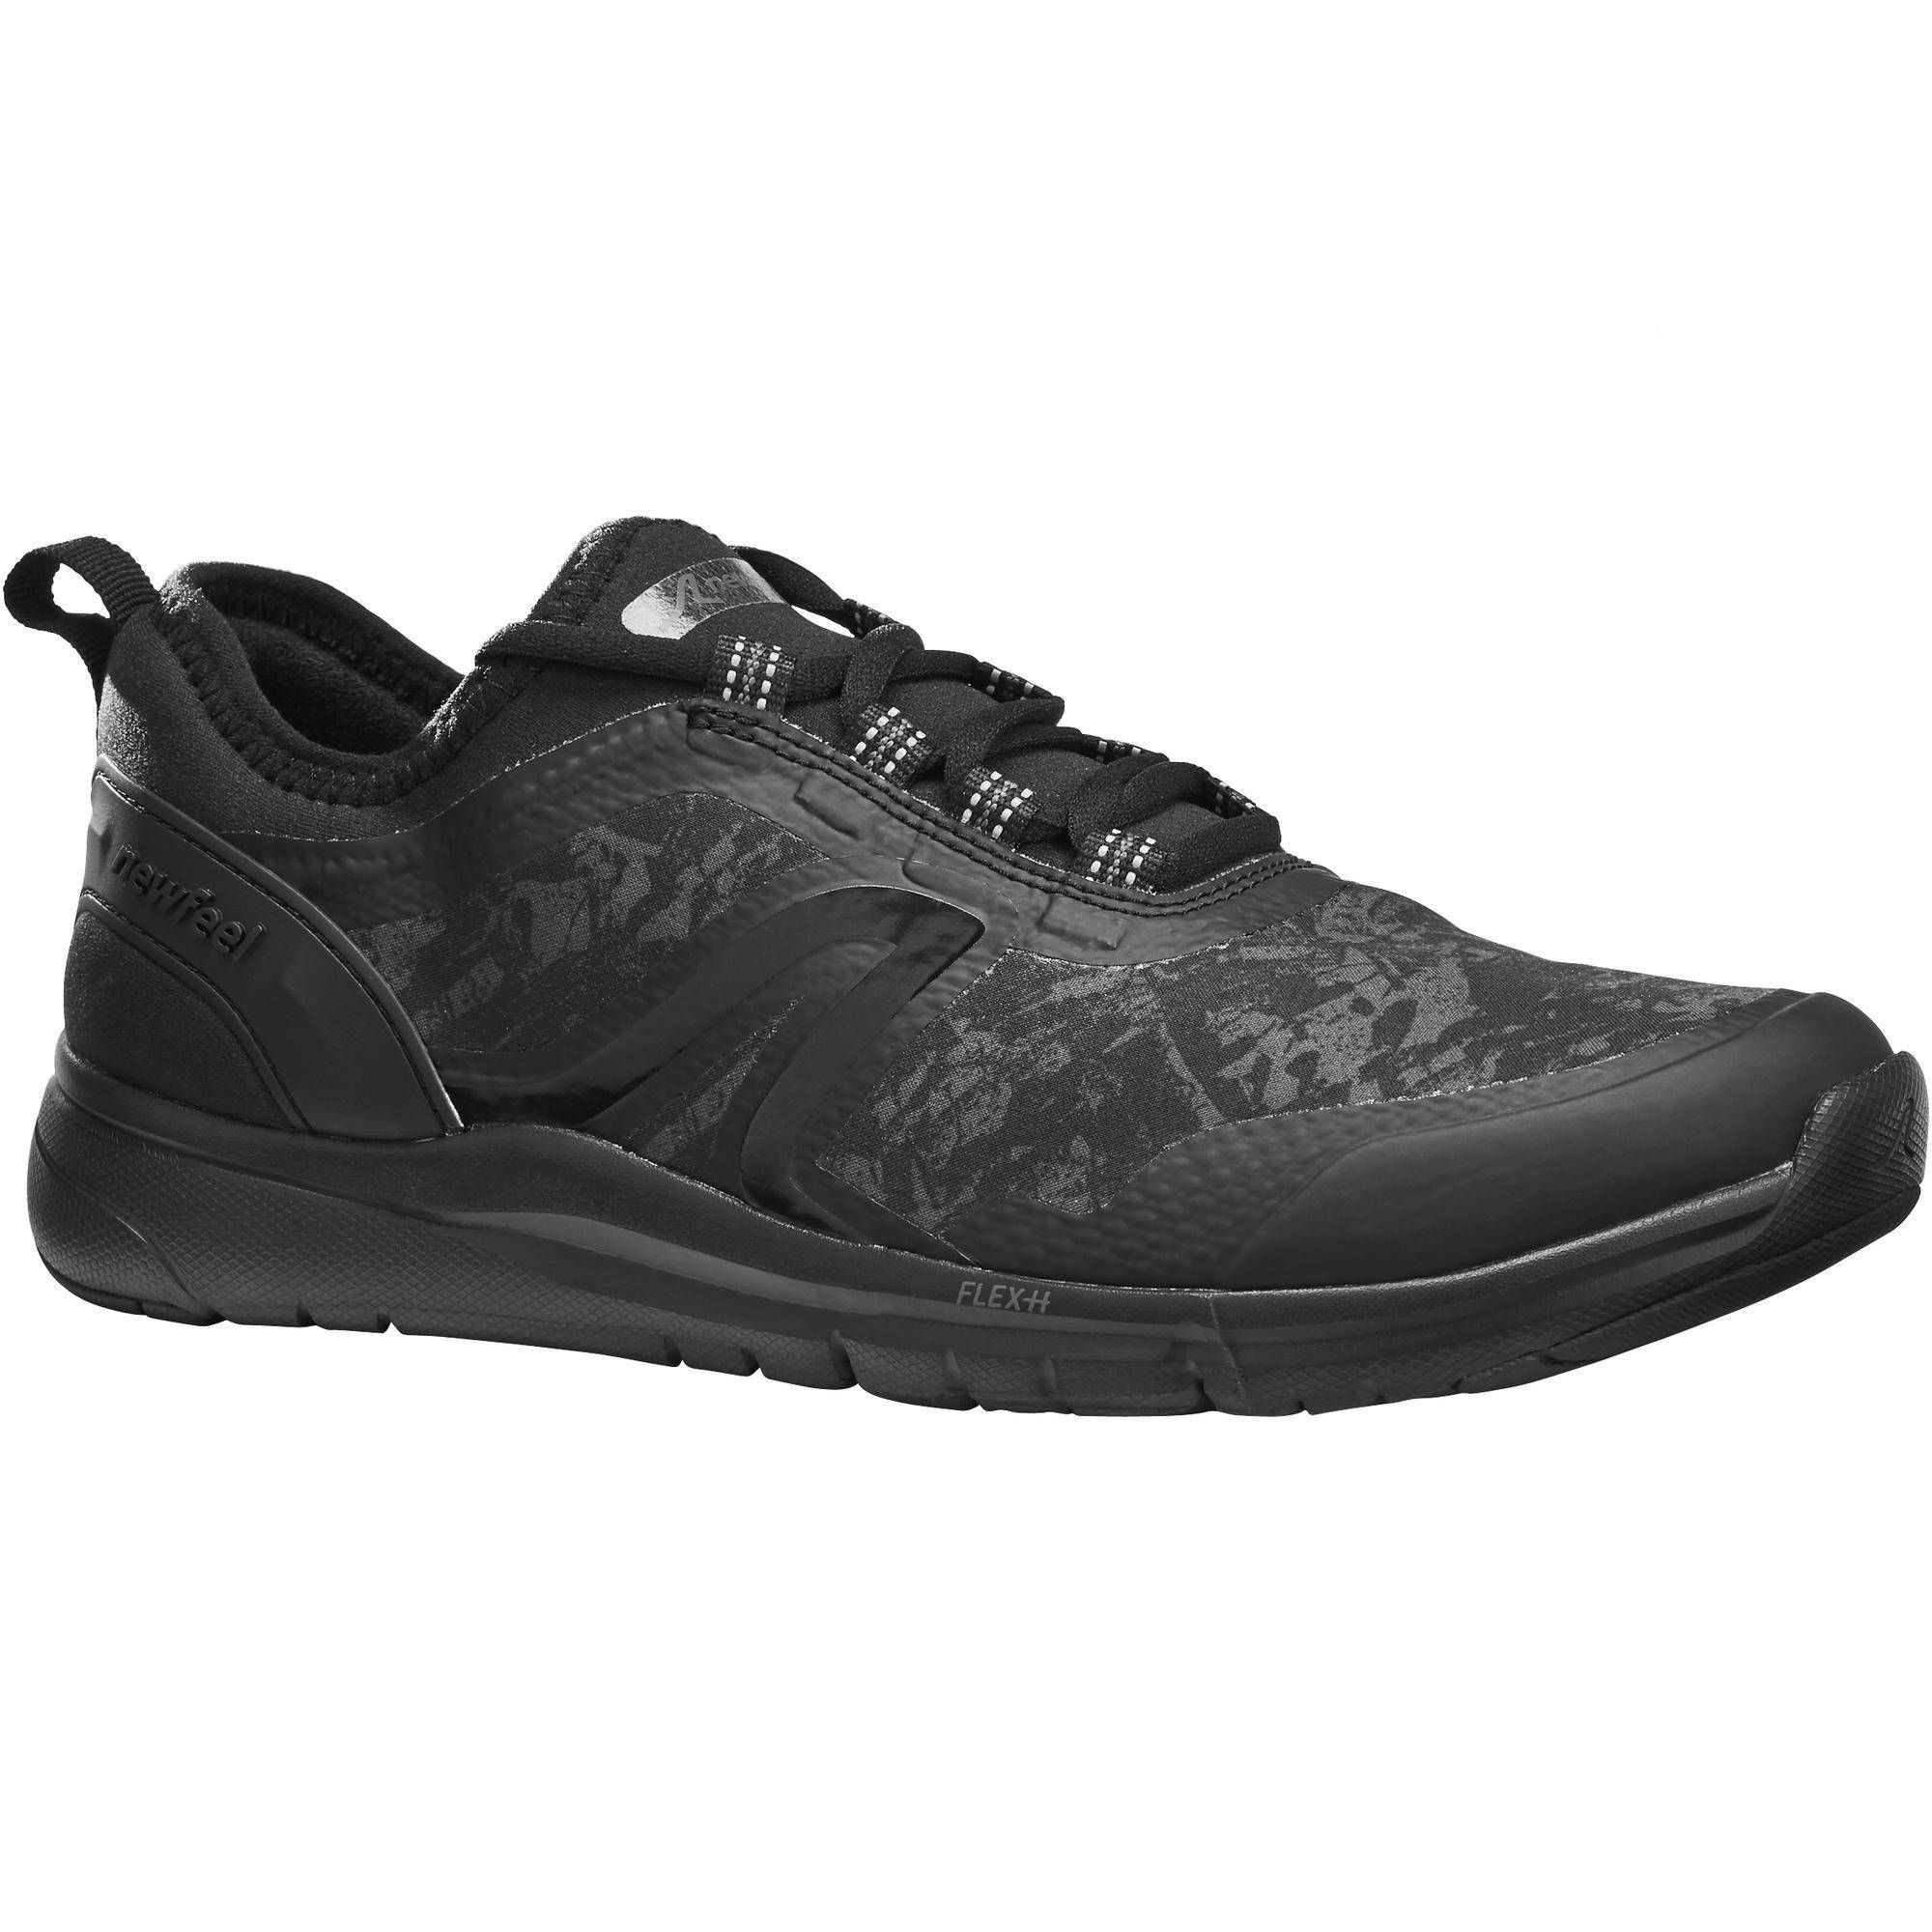 Newfeel Chaussures marche sportive femme PW 580 WaterResist noir - Newfeel